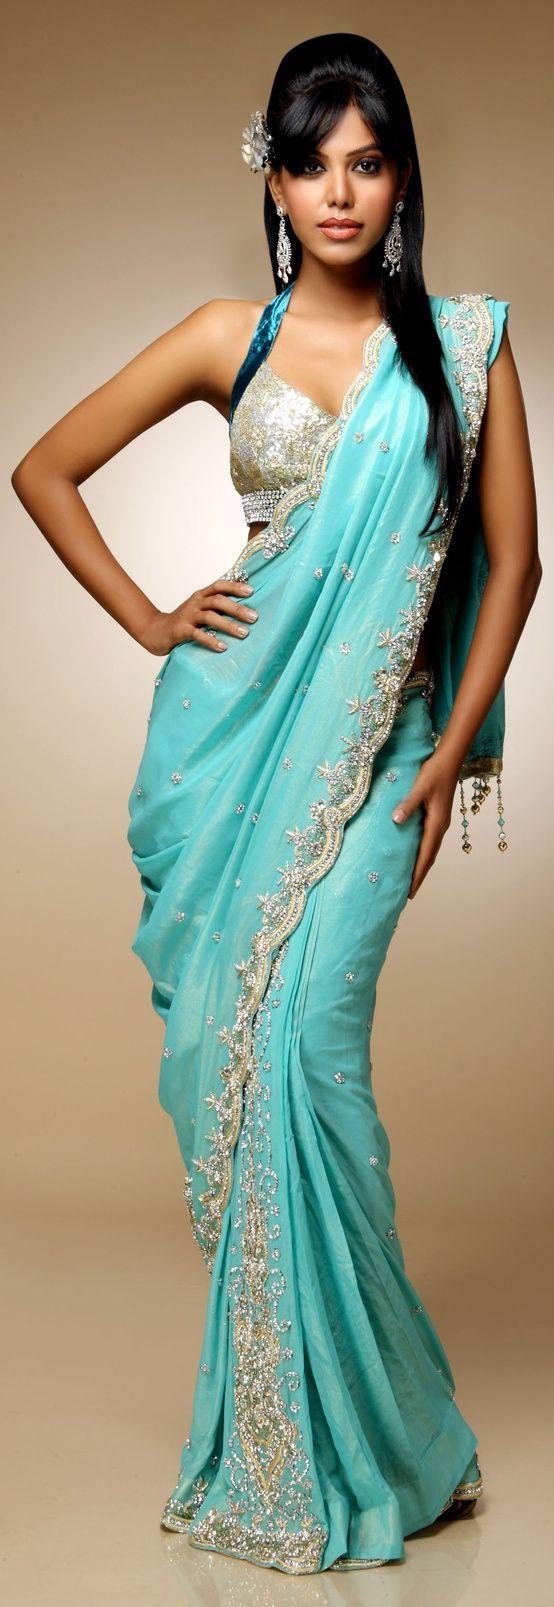 Saree blouse Bollywood Fashion - http://www.kangabulletin.com/online ...